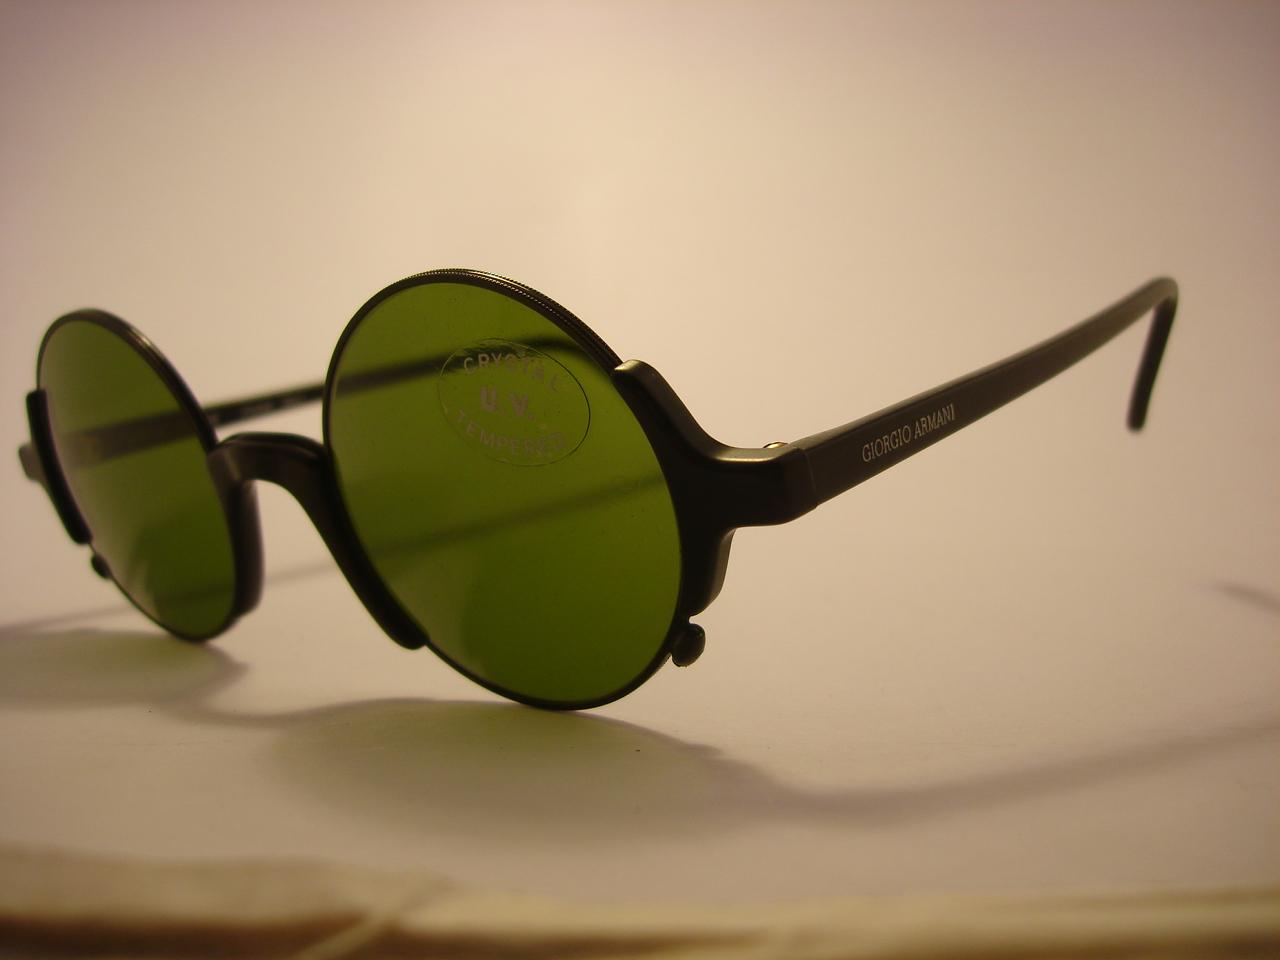 d888497708a Giorgio Armani Vintage Sunglasses « Heritage Malta